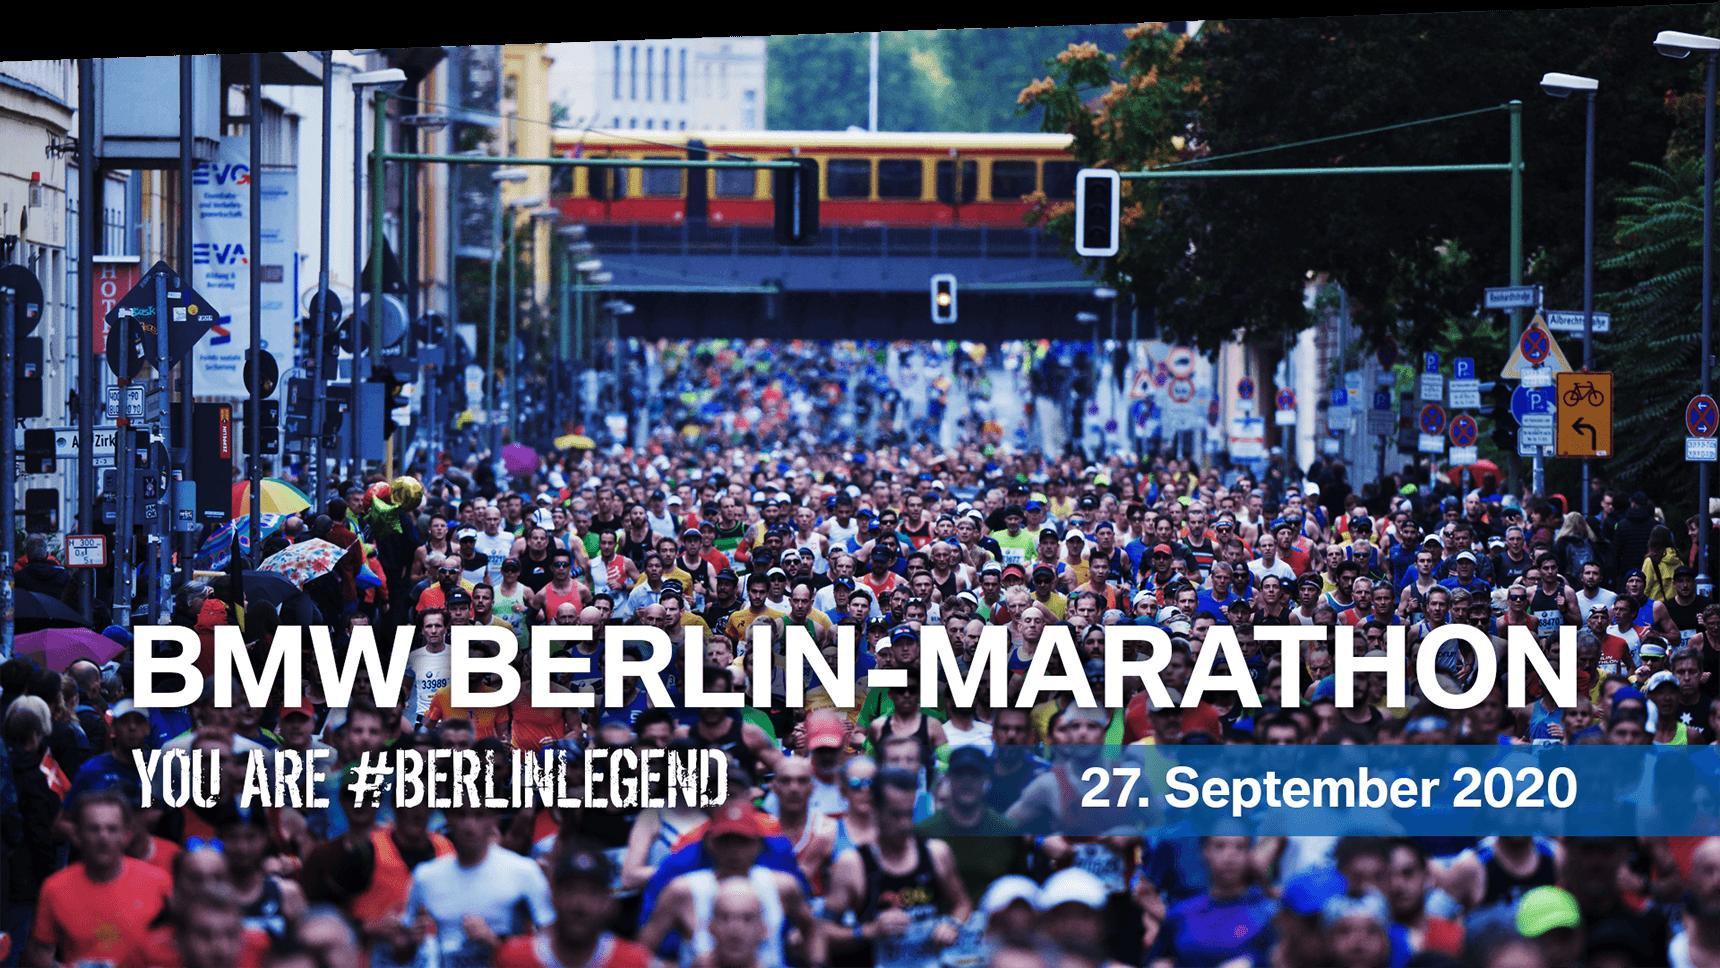 BMW BERLIN MARATHON: bmw berlin